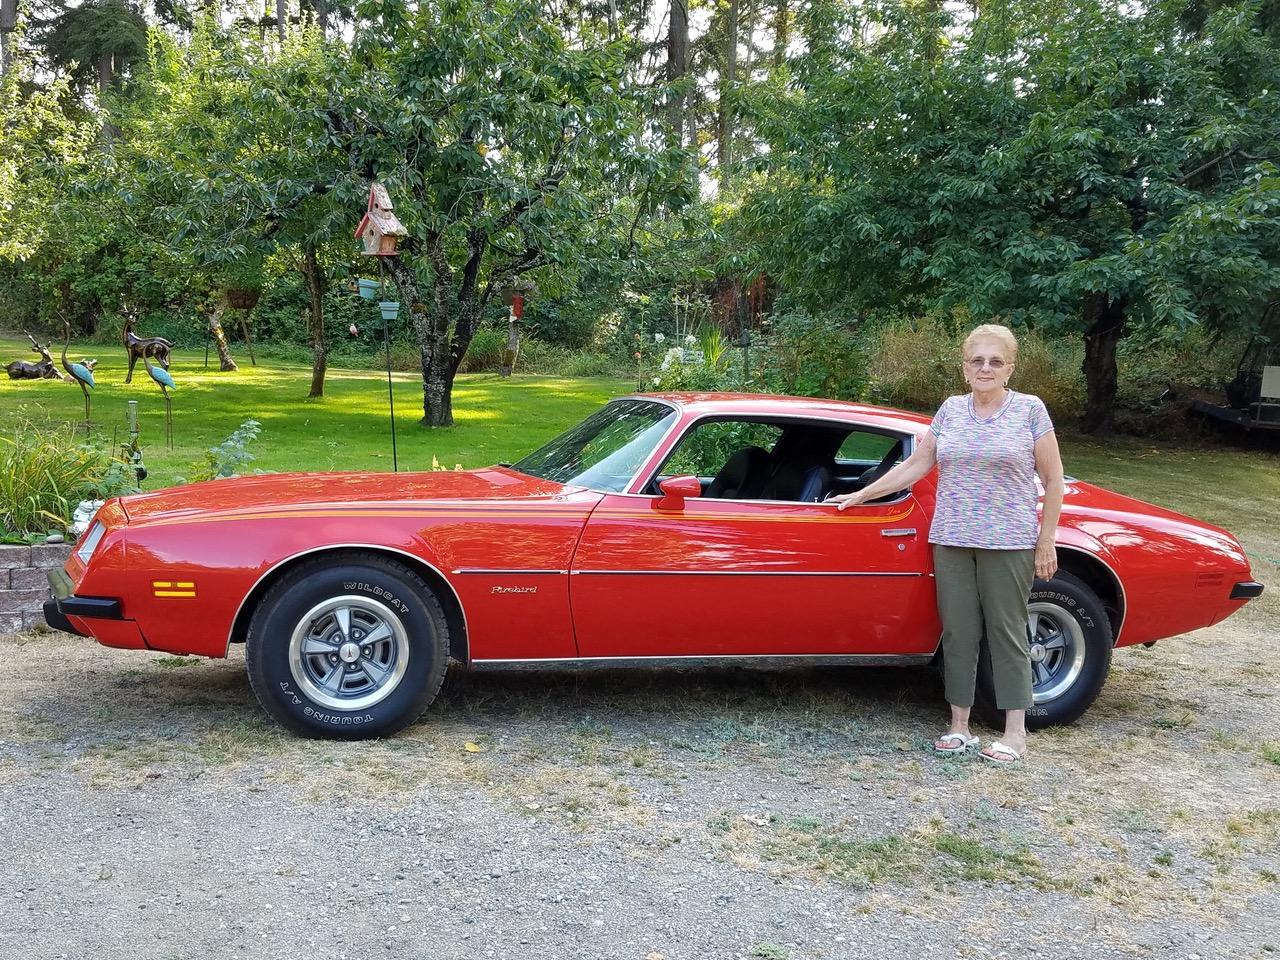 Jan Kammenga 1975 Pontiac Firebird